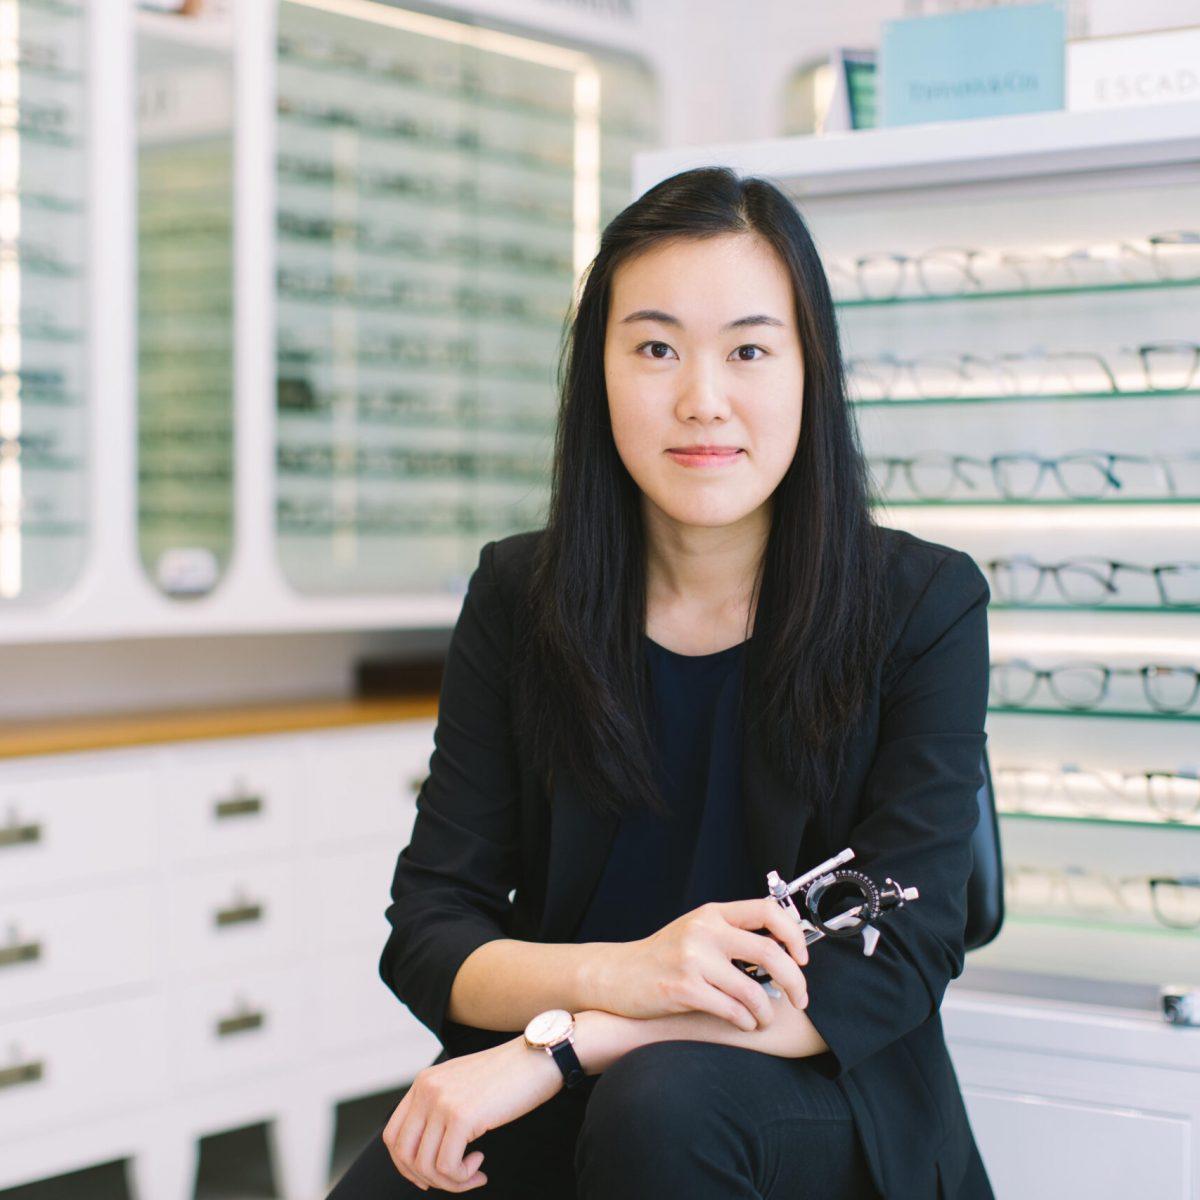 Female Optometrist holding a trial frame